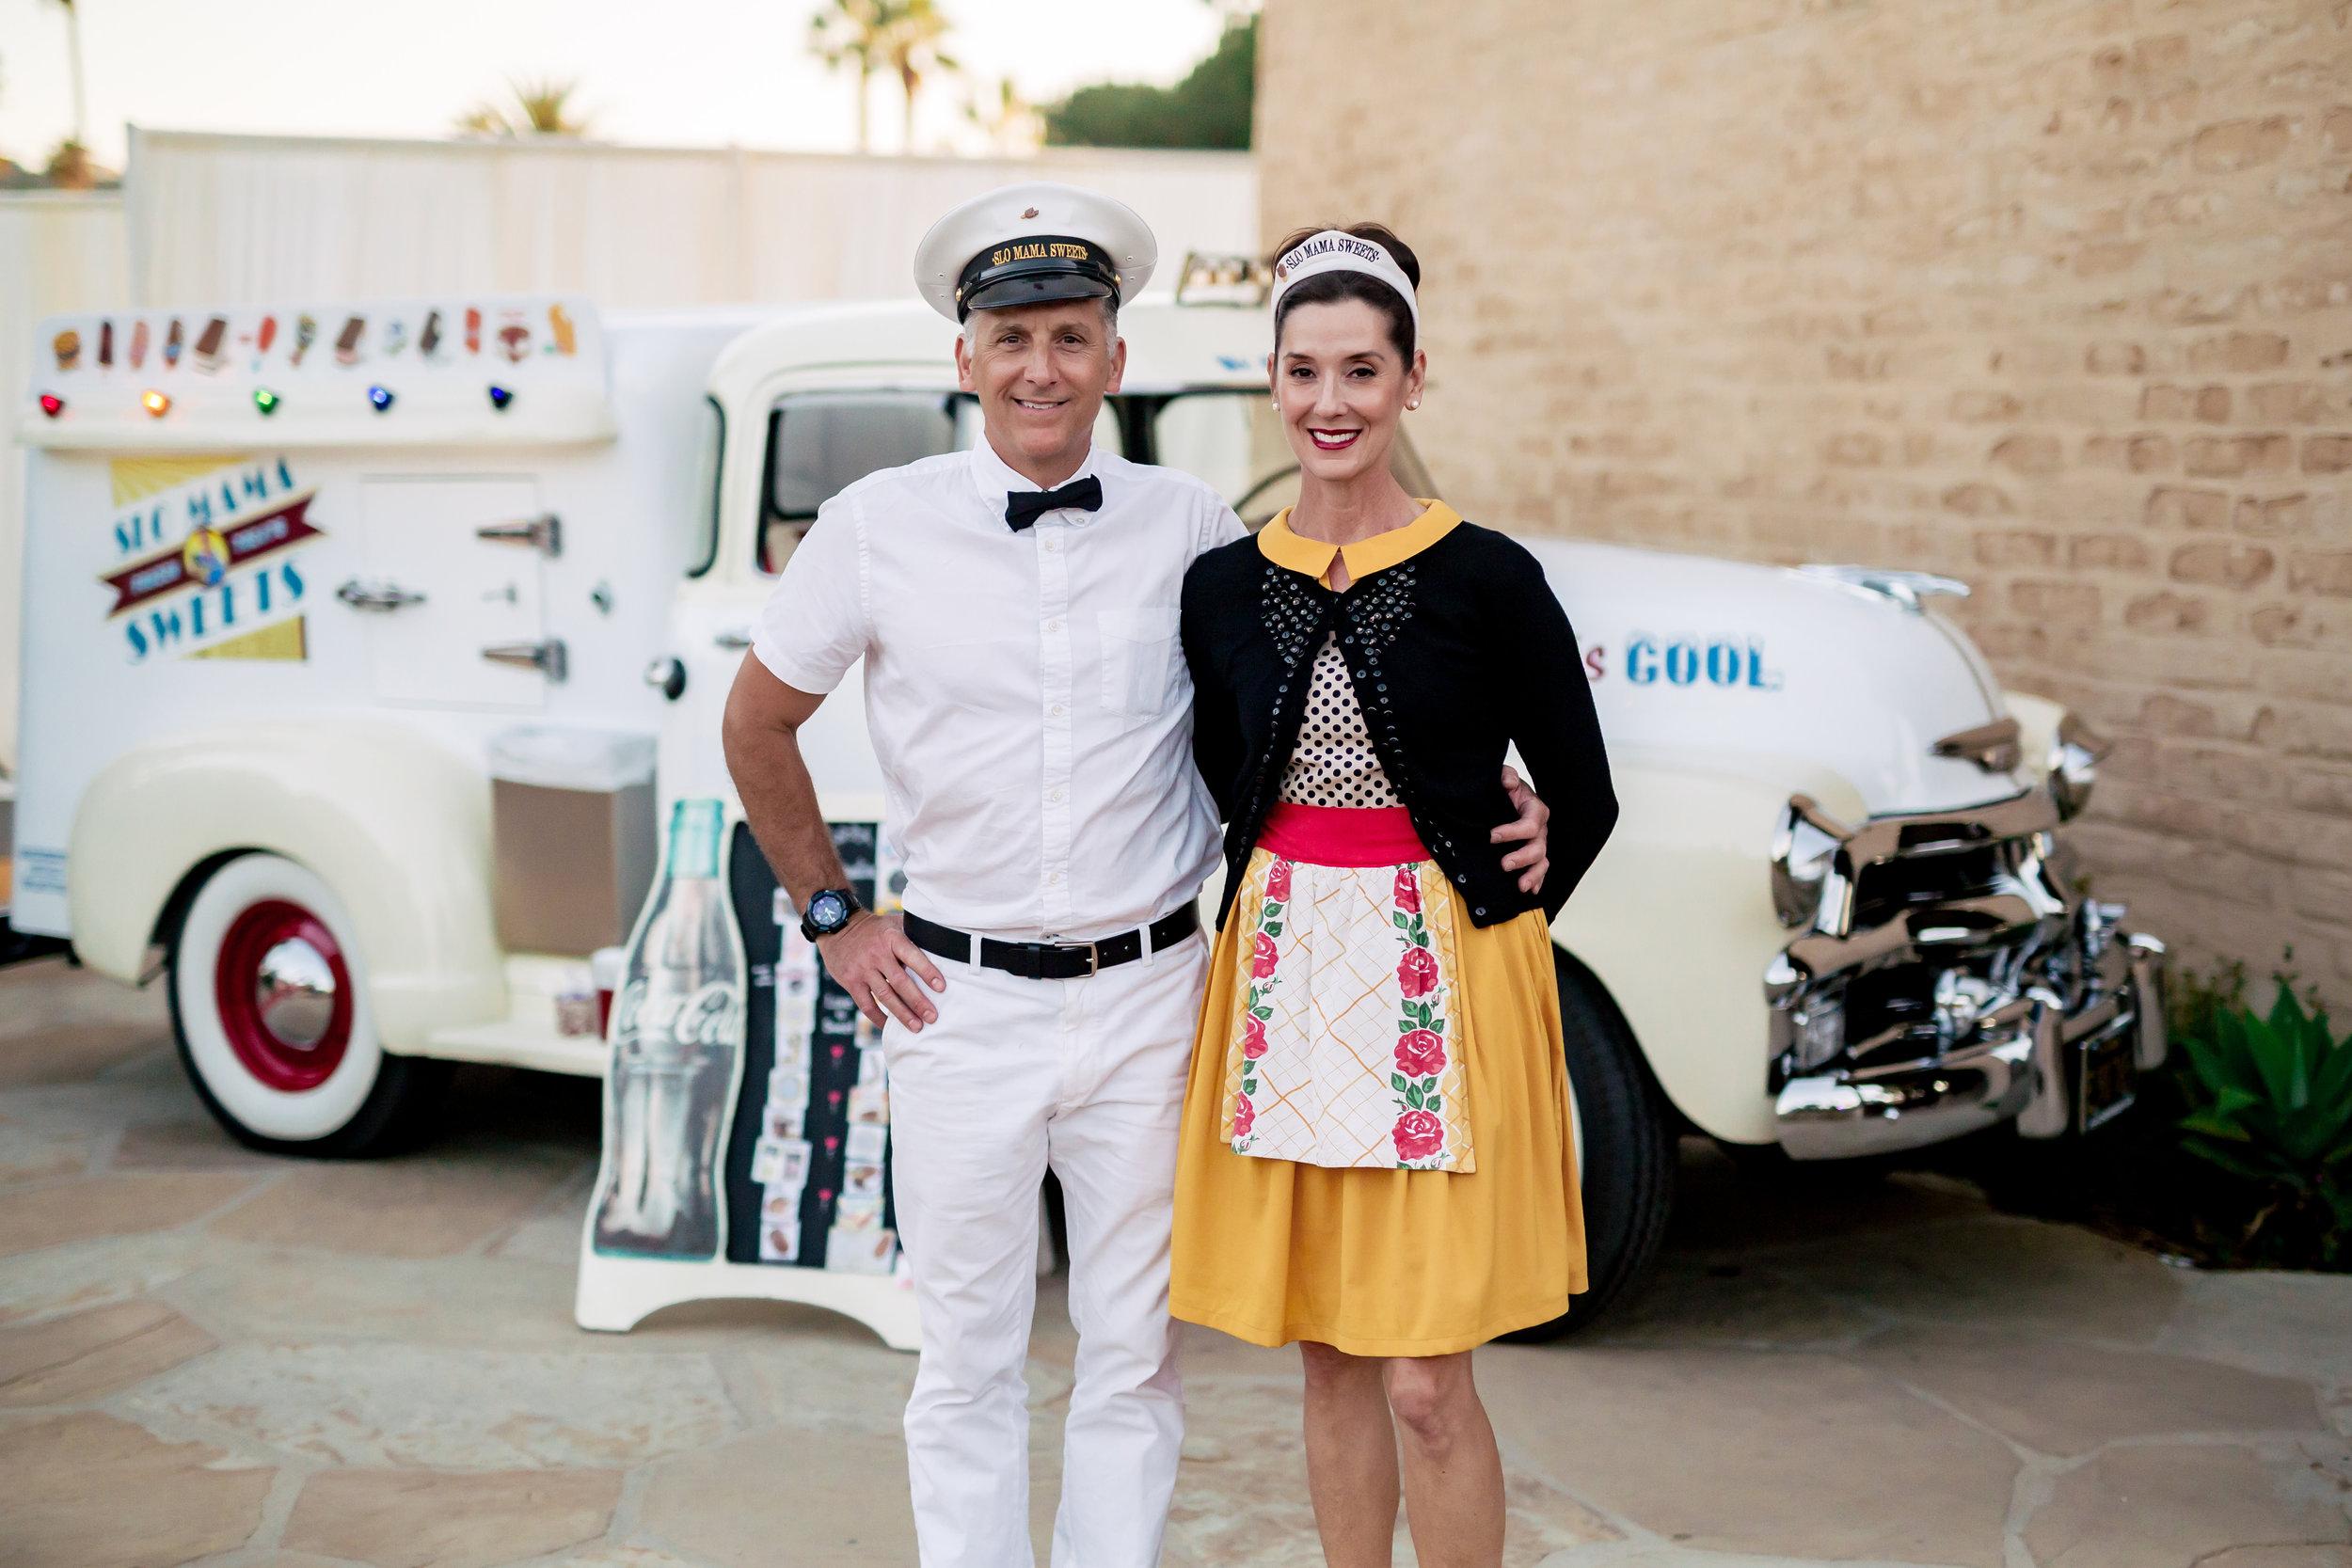 www.santabarbarawedding.com | Rewind Photography | Events by M and M | Santa Barbara Historical Museum | Ice Cream Truck